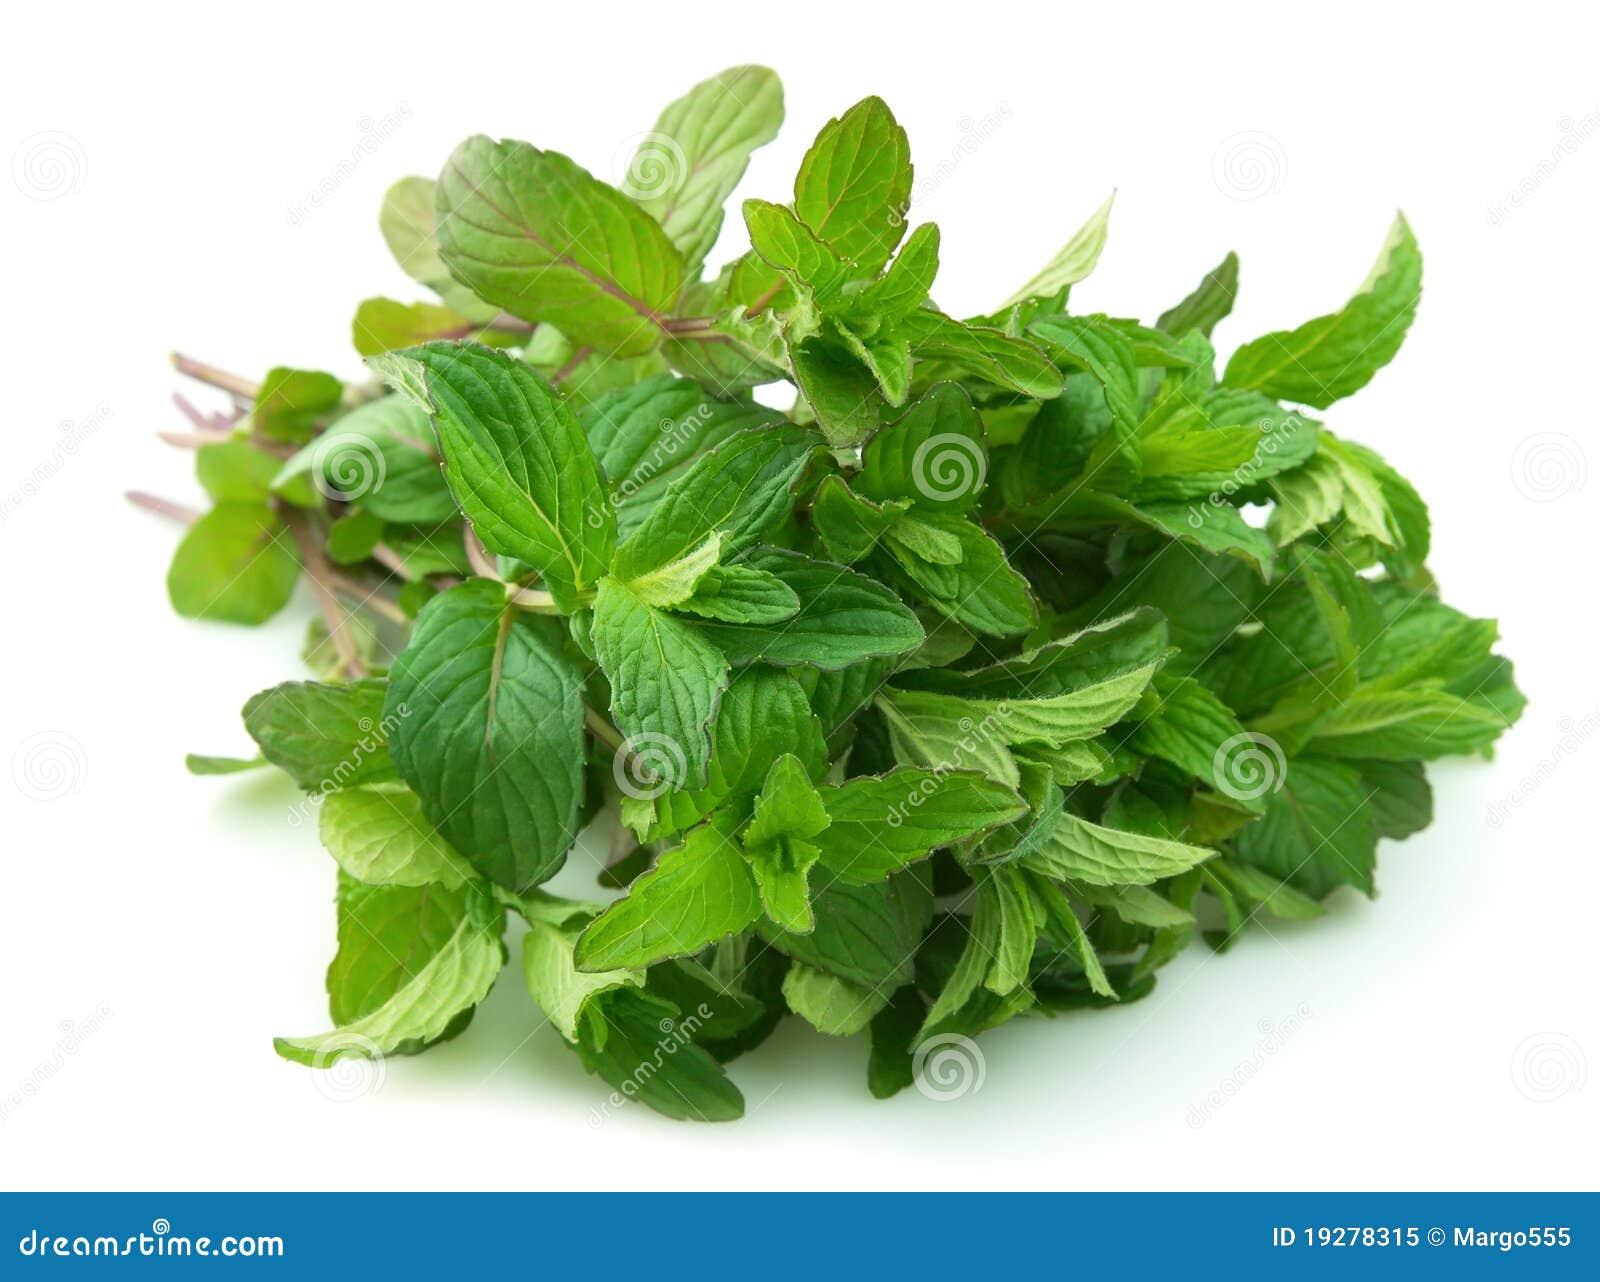 how to cut fresh mint